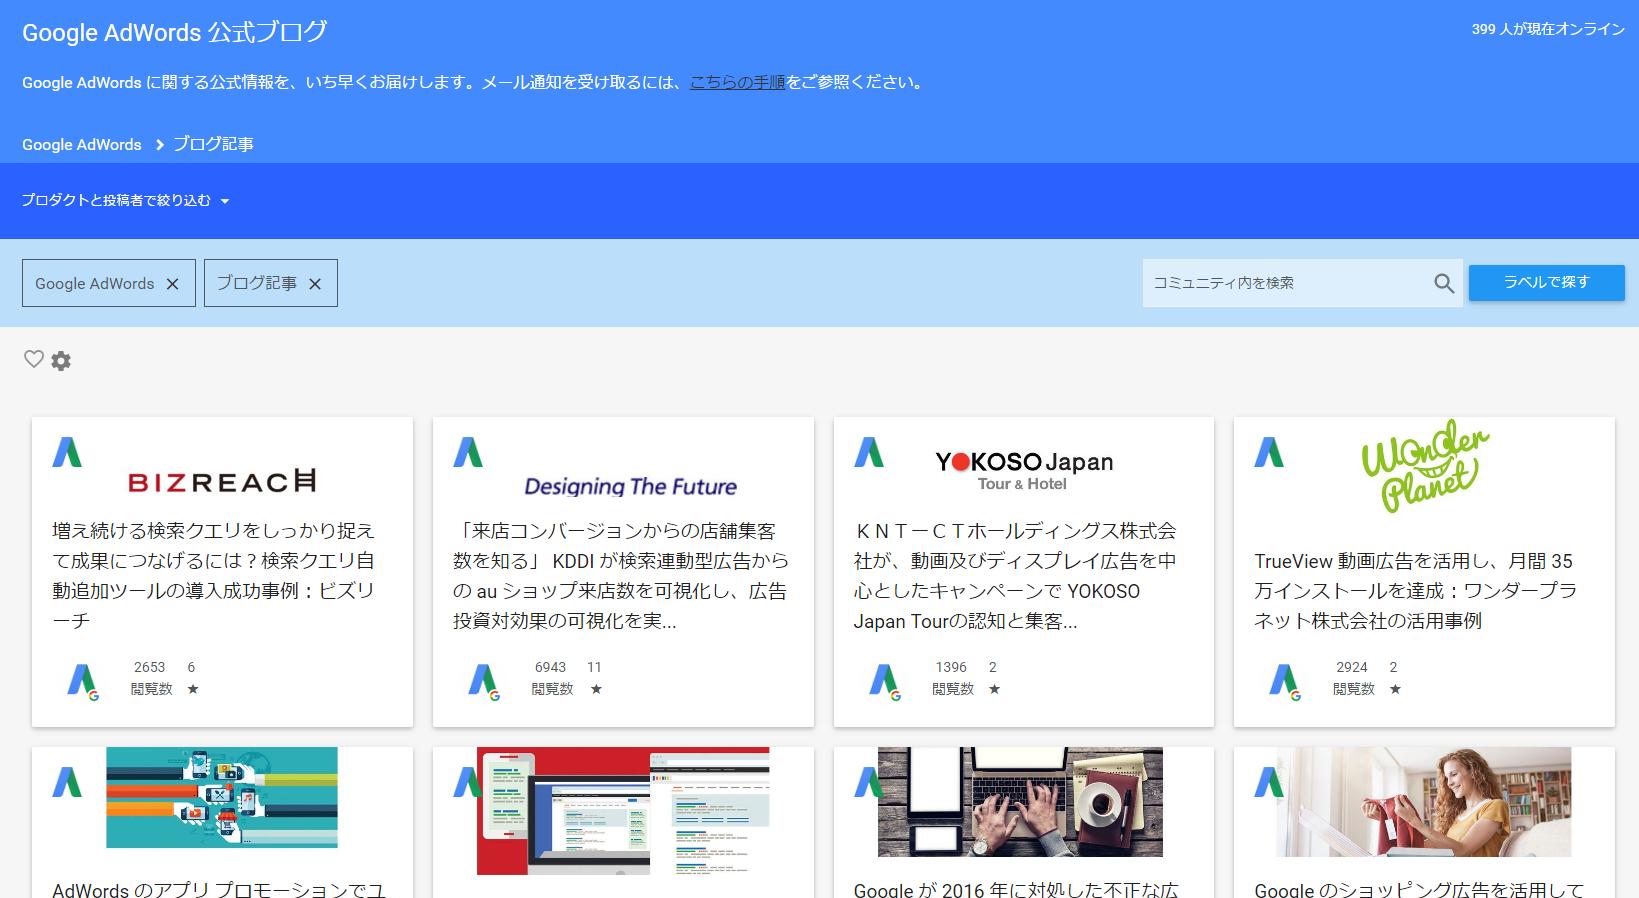 Google AdWords公式ブログ